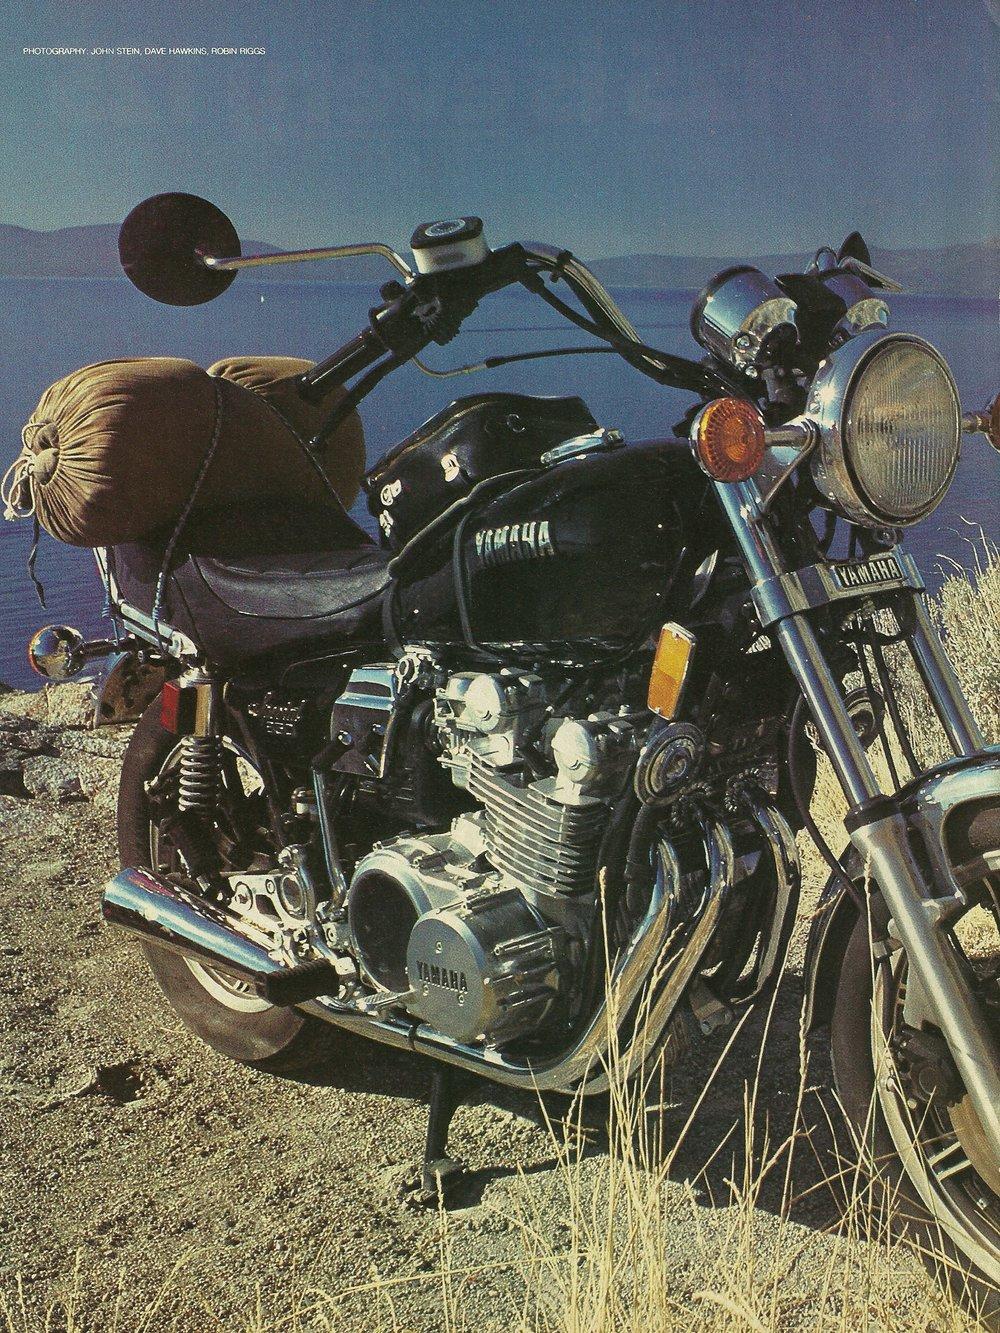 1980 Yamaha XS850SG road test 1.JPG